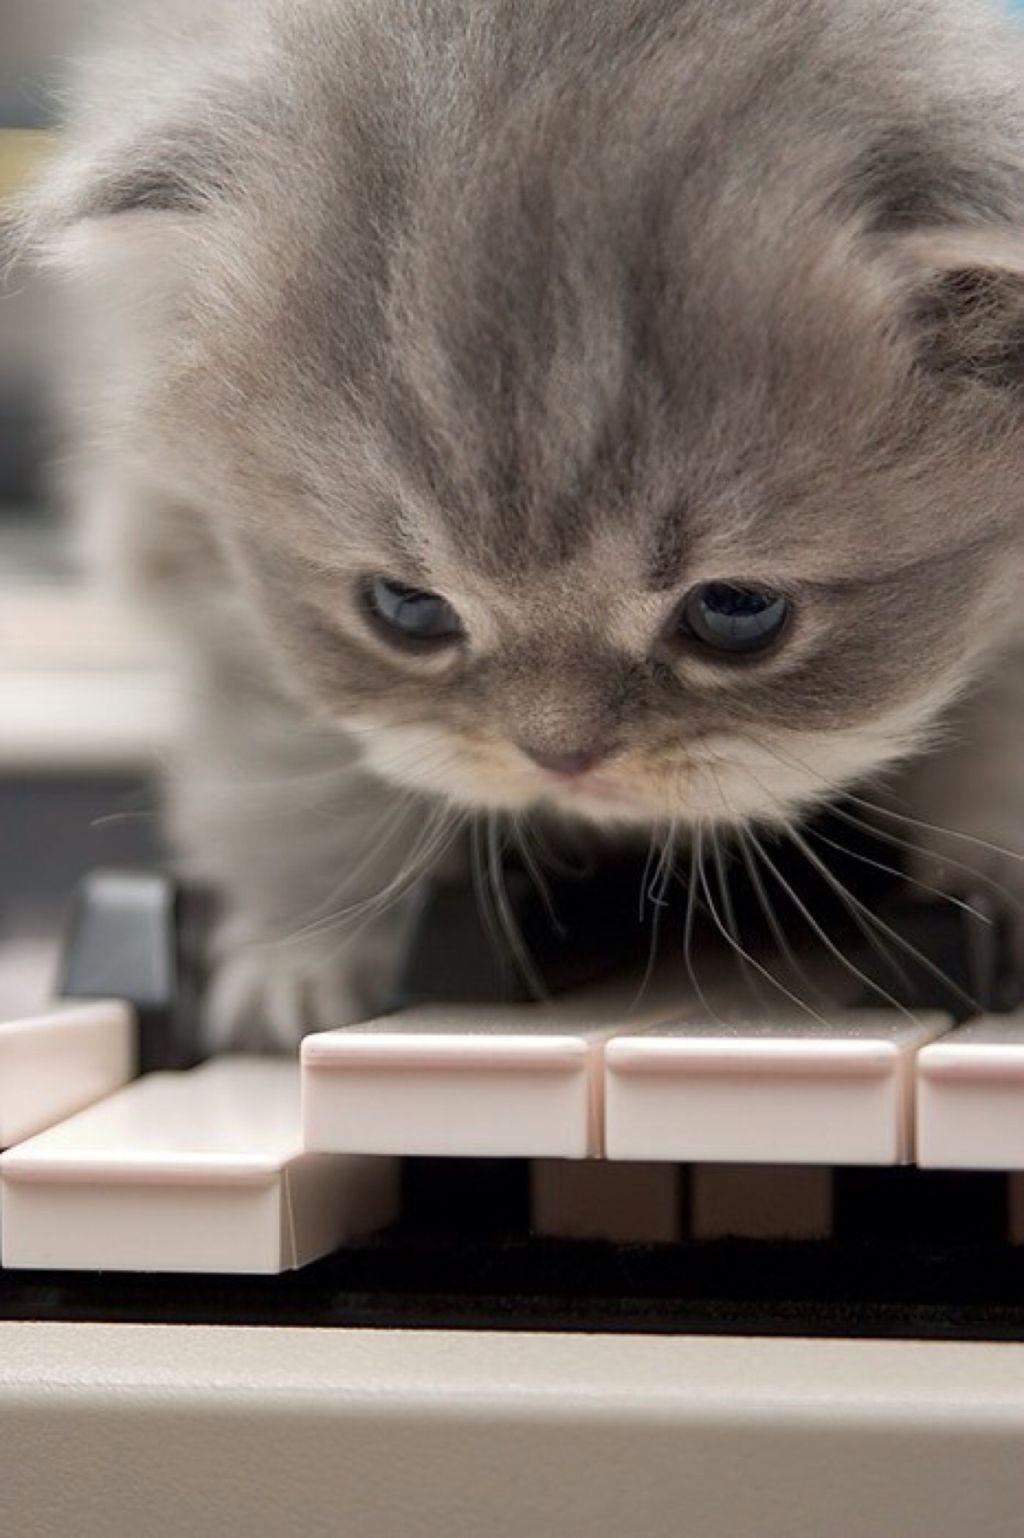 Piano Cat Kitten On The Keys Ccp Cat Cuddle Cute